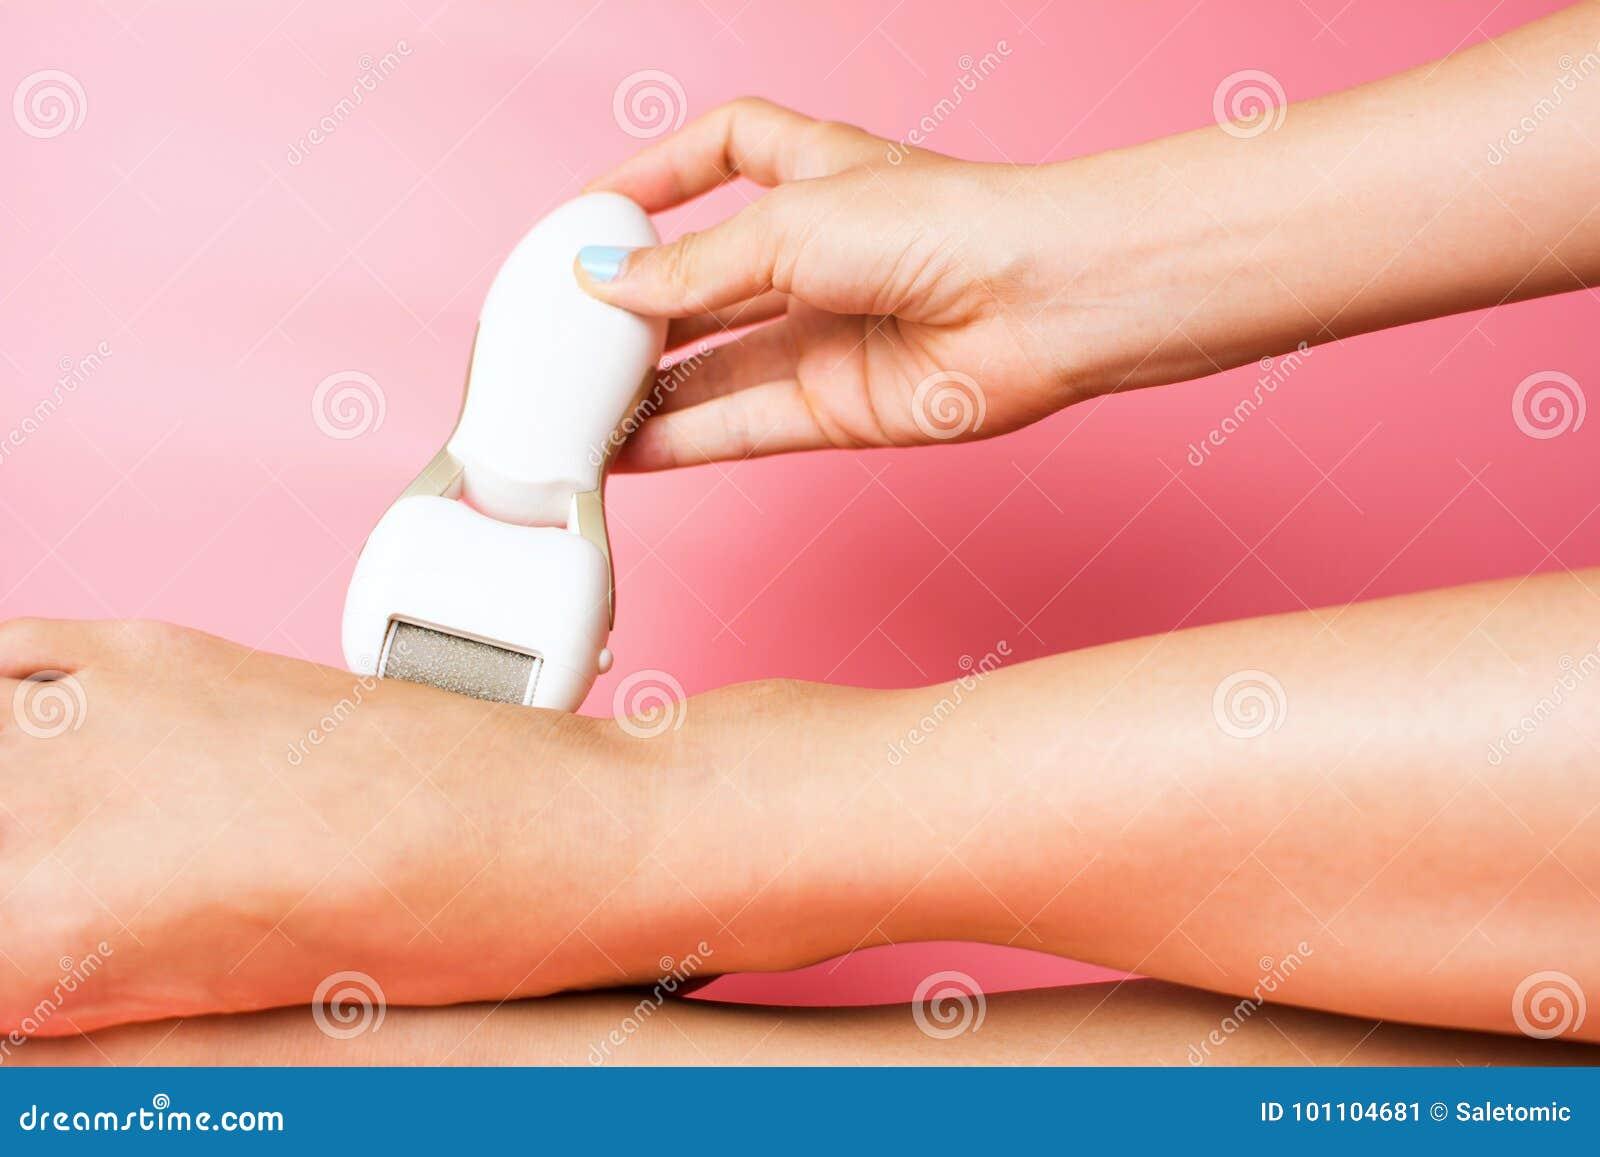 Female scrubbing hard skin from feet